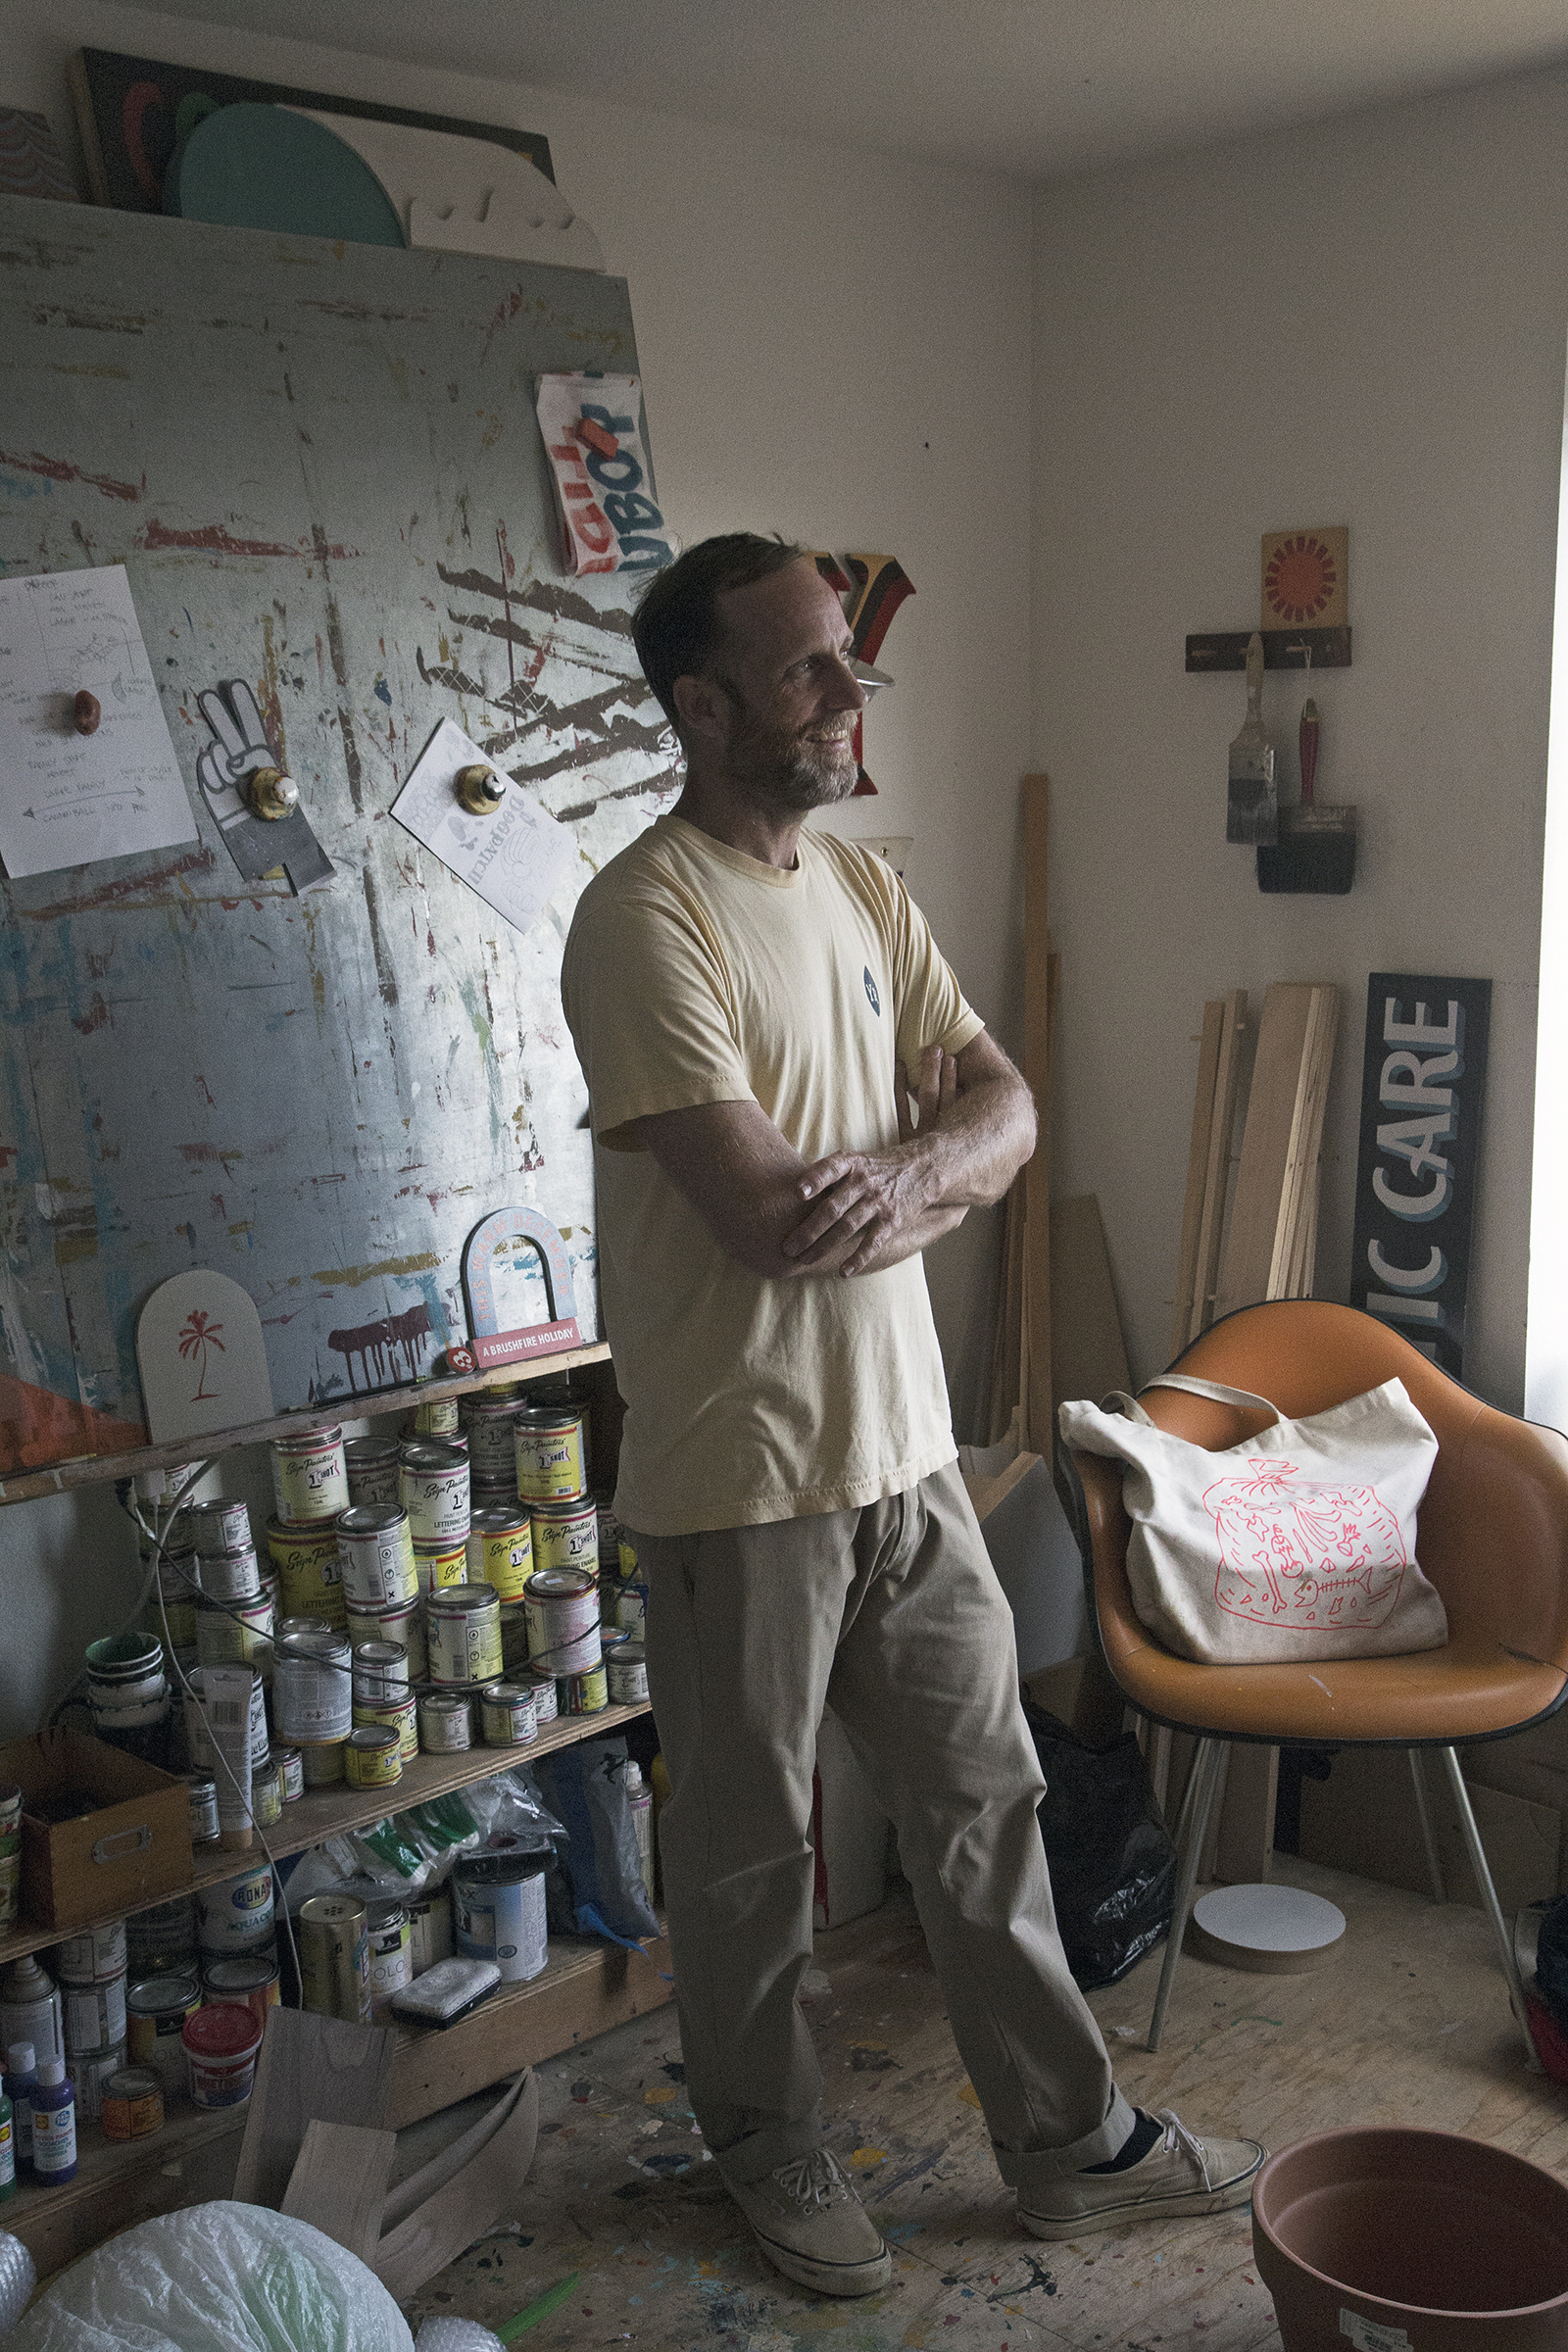 Jeff Canham in San Francisco studio